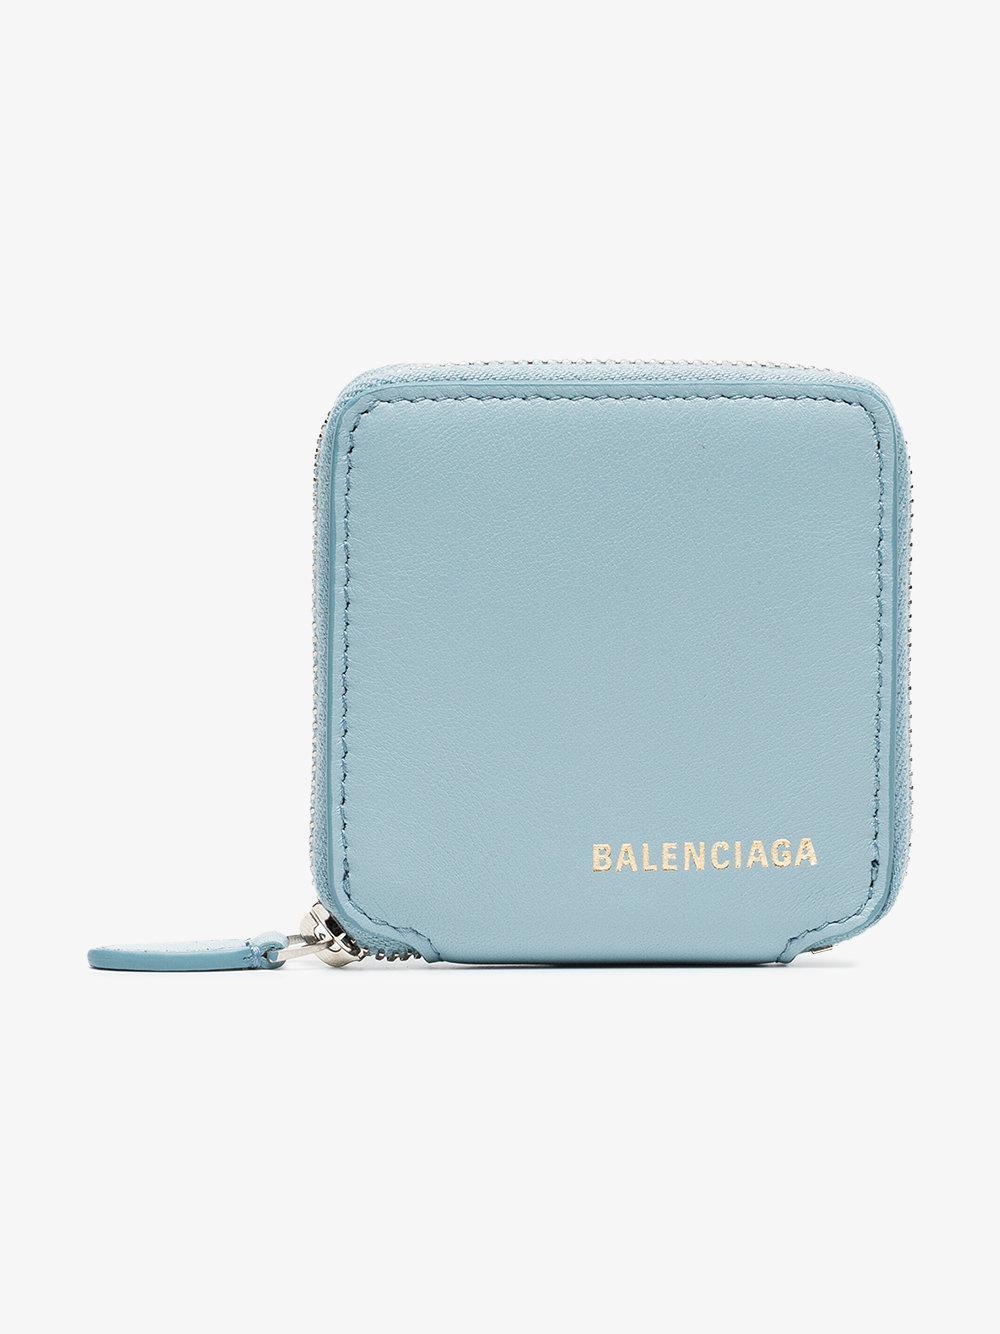 blue logo stamp leather coin wallet Balenciaga ESQ9G